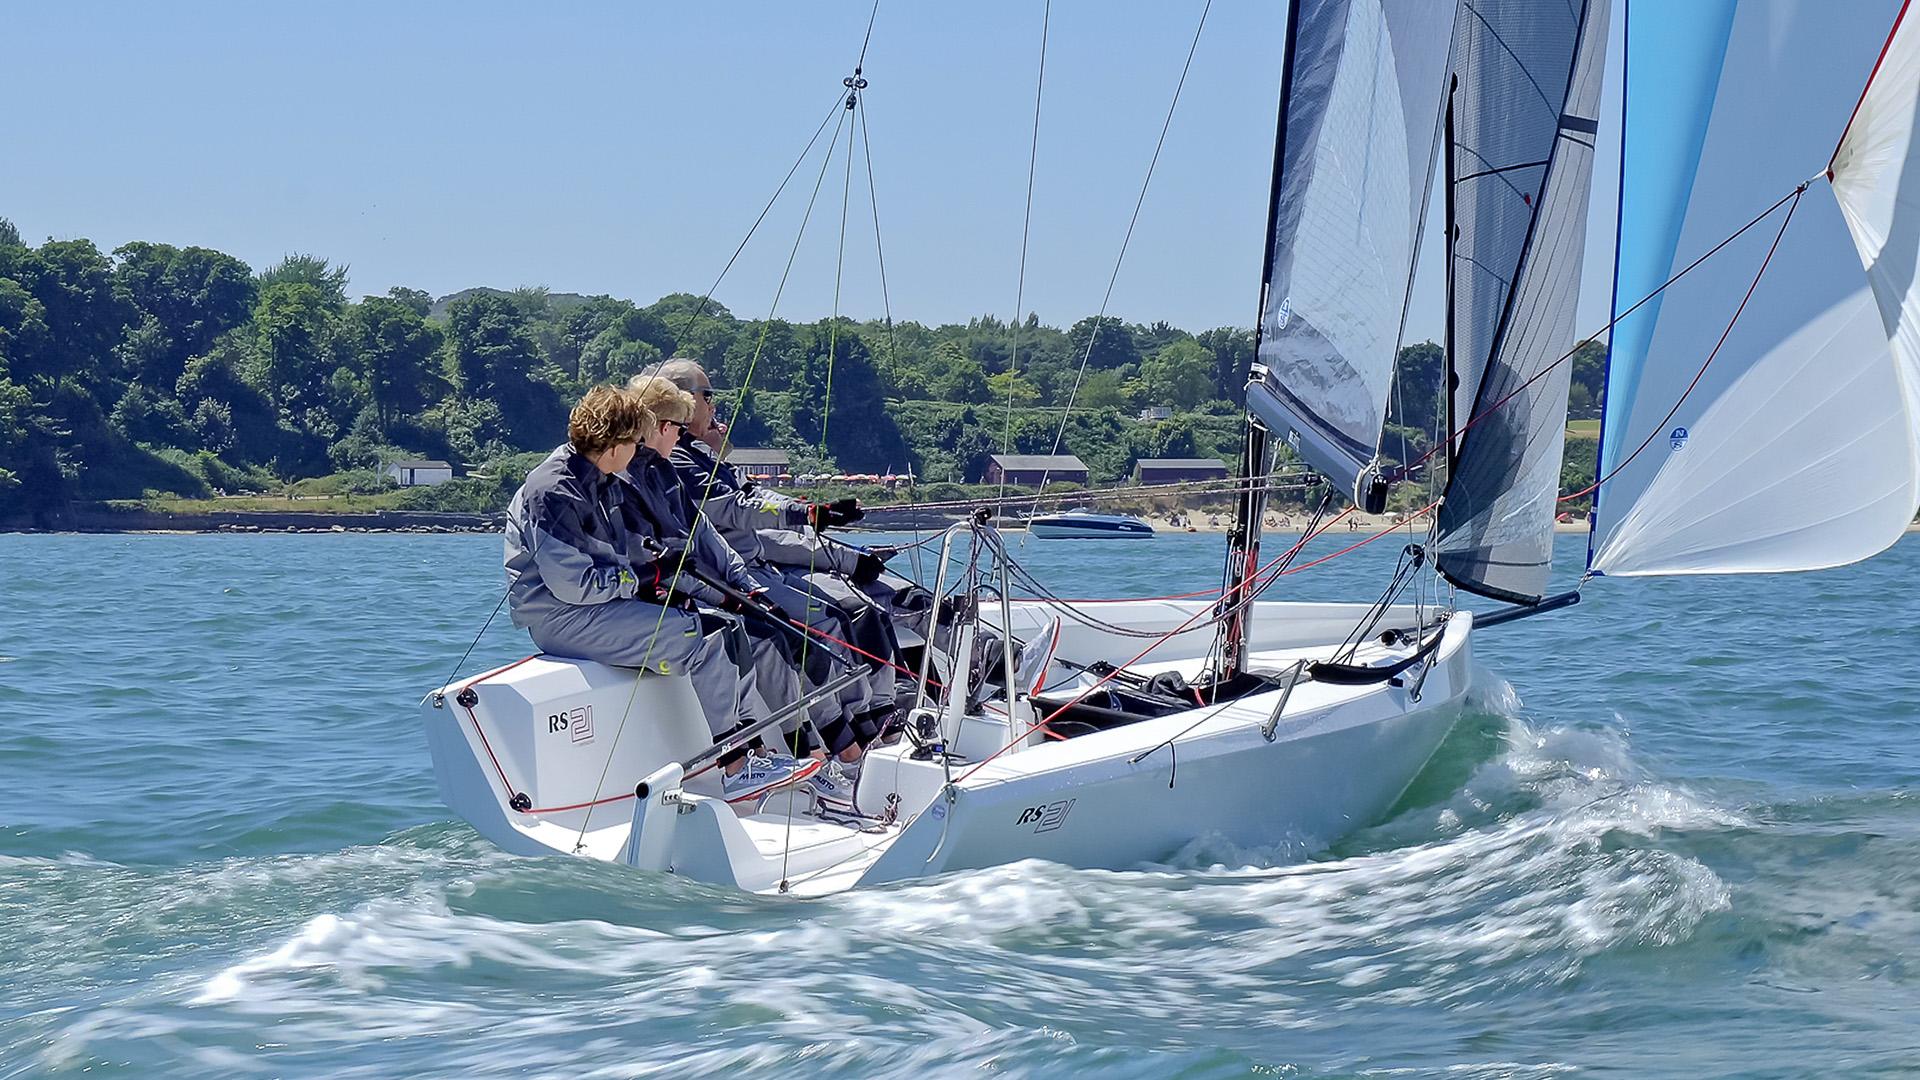 RS 21 Central Coast Sailing 5.jpg